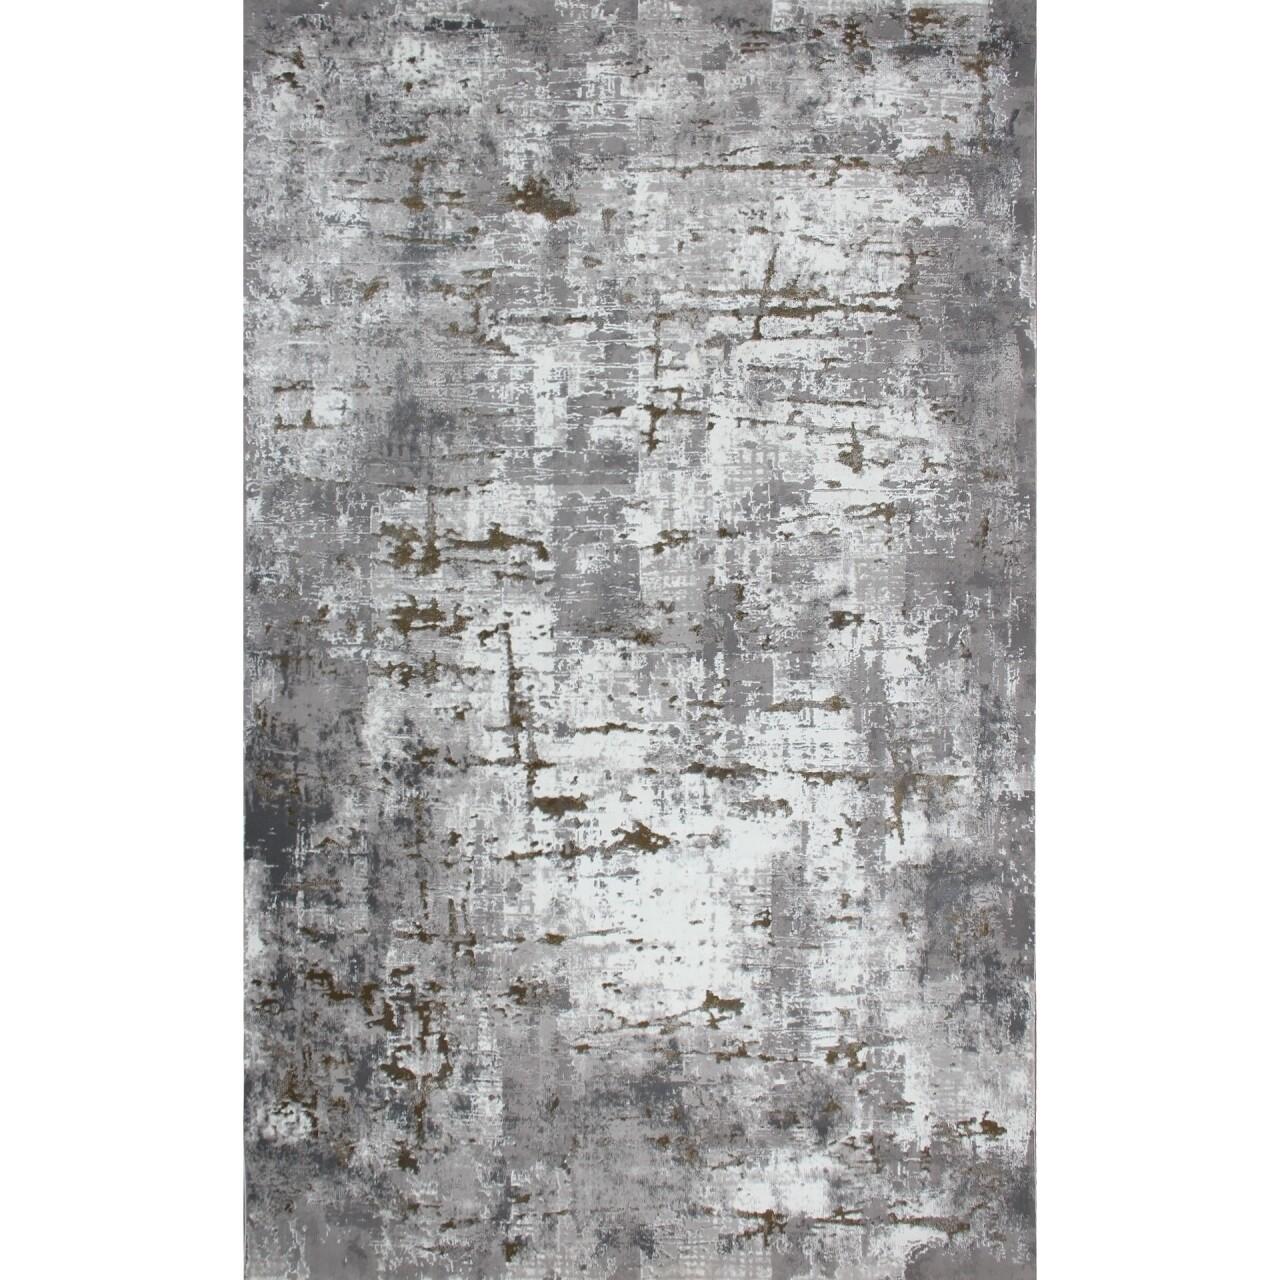 Covor rezistent Eko, CM 08 - Grey, Gold , 100% poliester, 80 x 150 cm